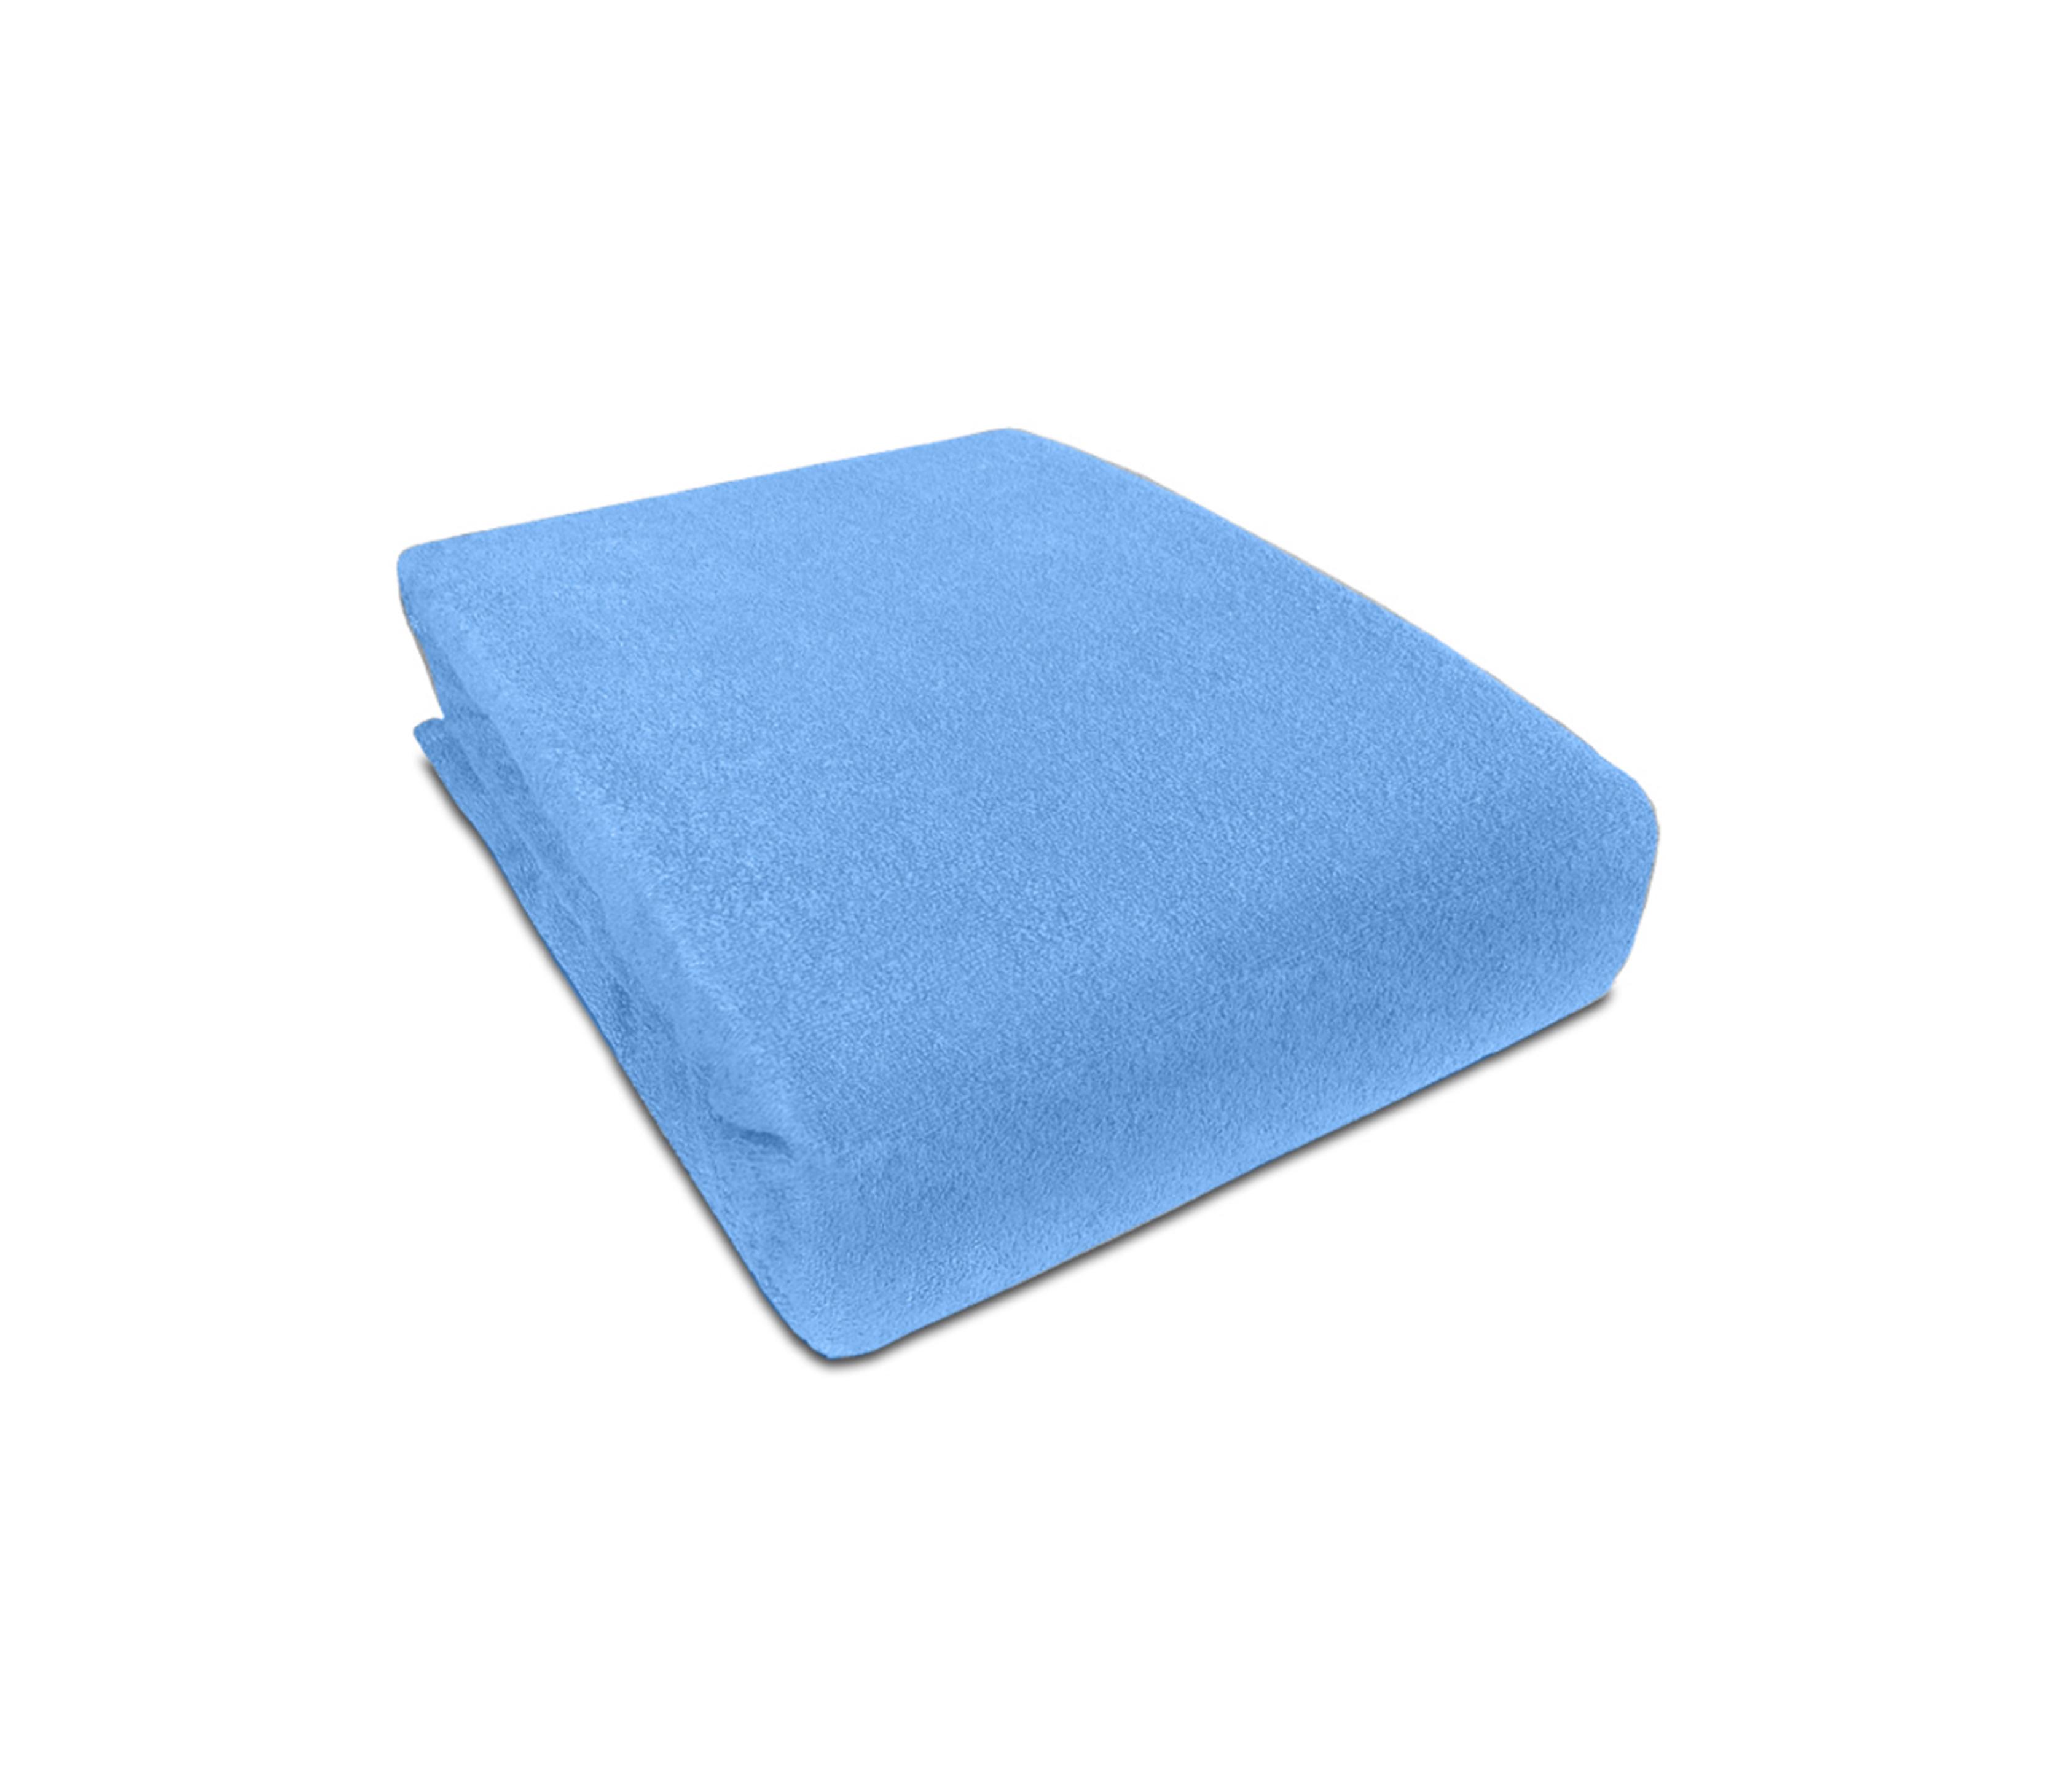 Aga prostěradlo FROTÉ 160X200 cm Barva prostěradla: Pastelově modrá